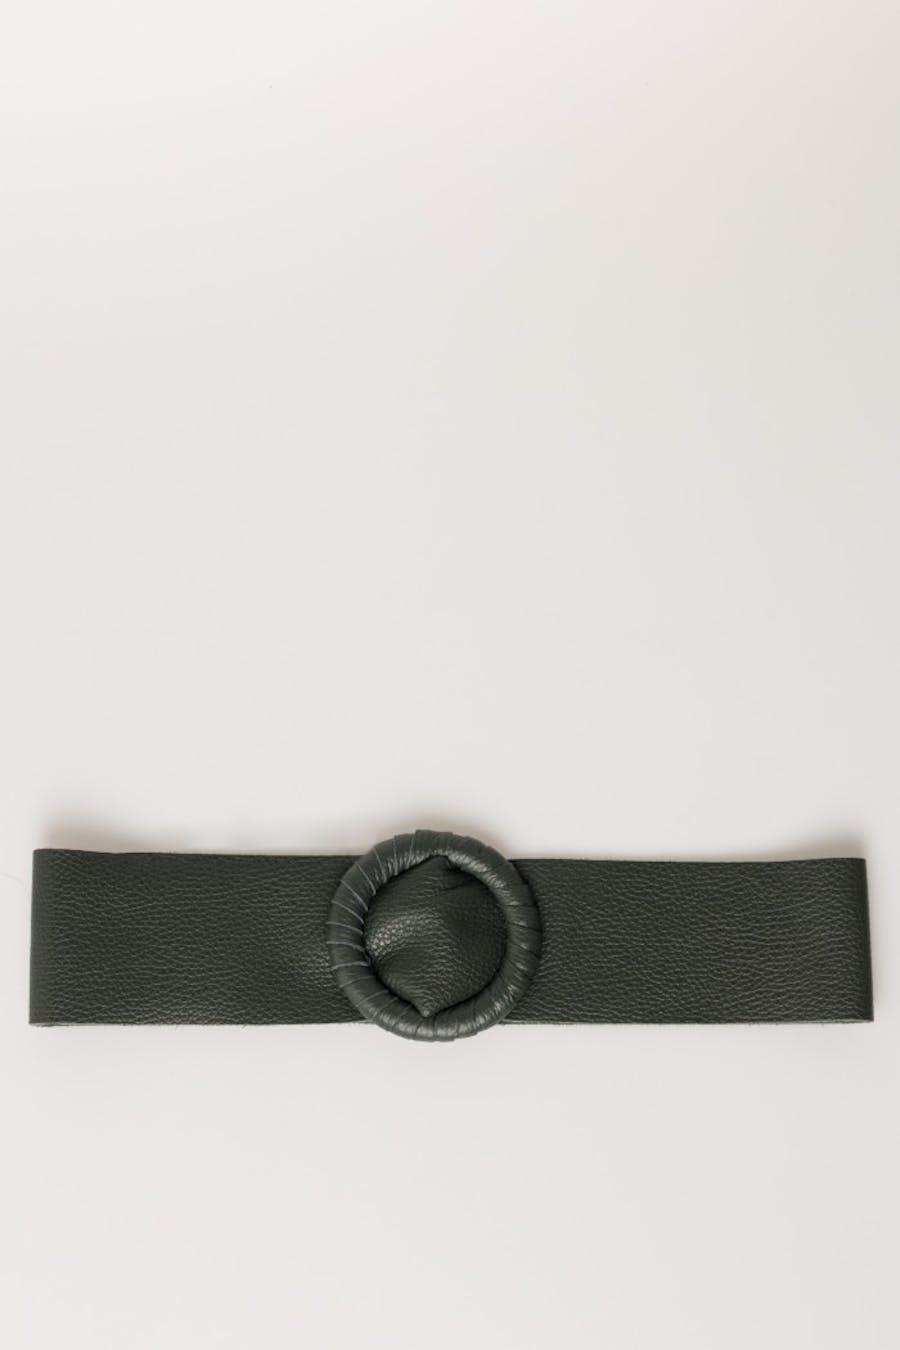 Cinturón massima grazia piel Verde